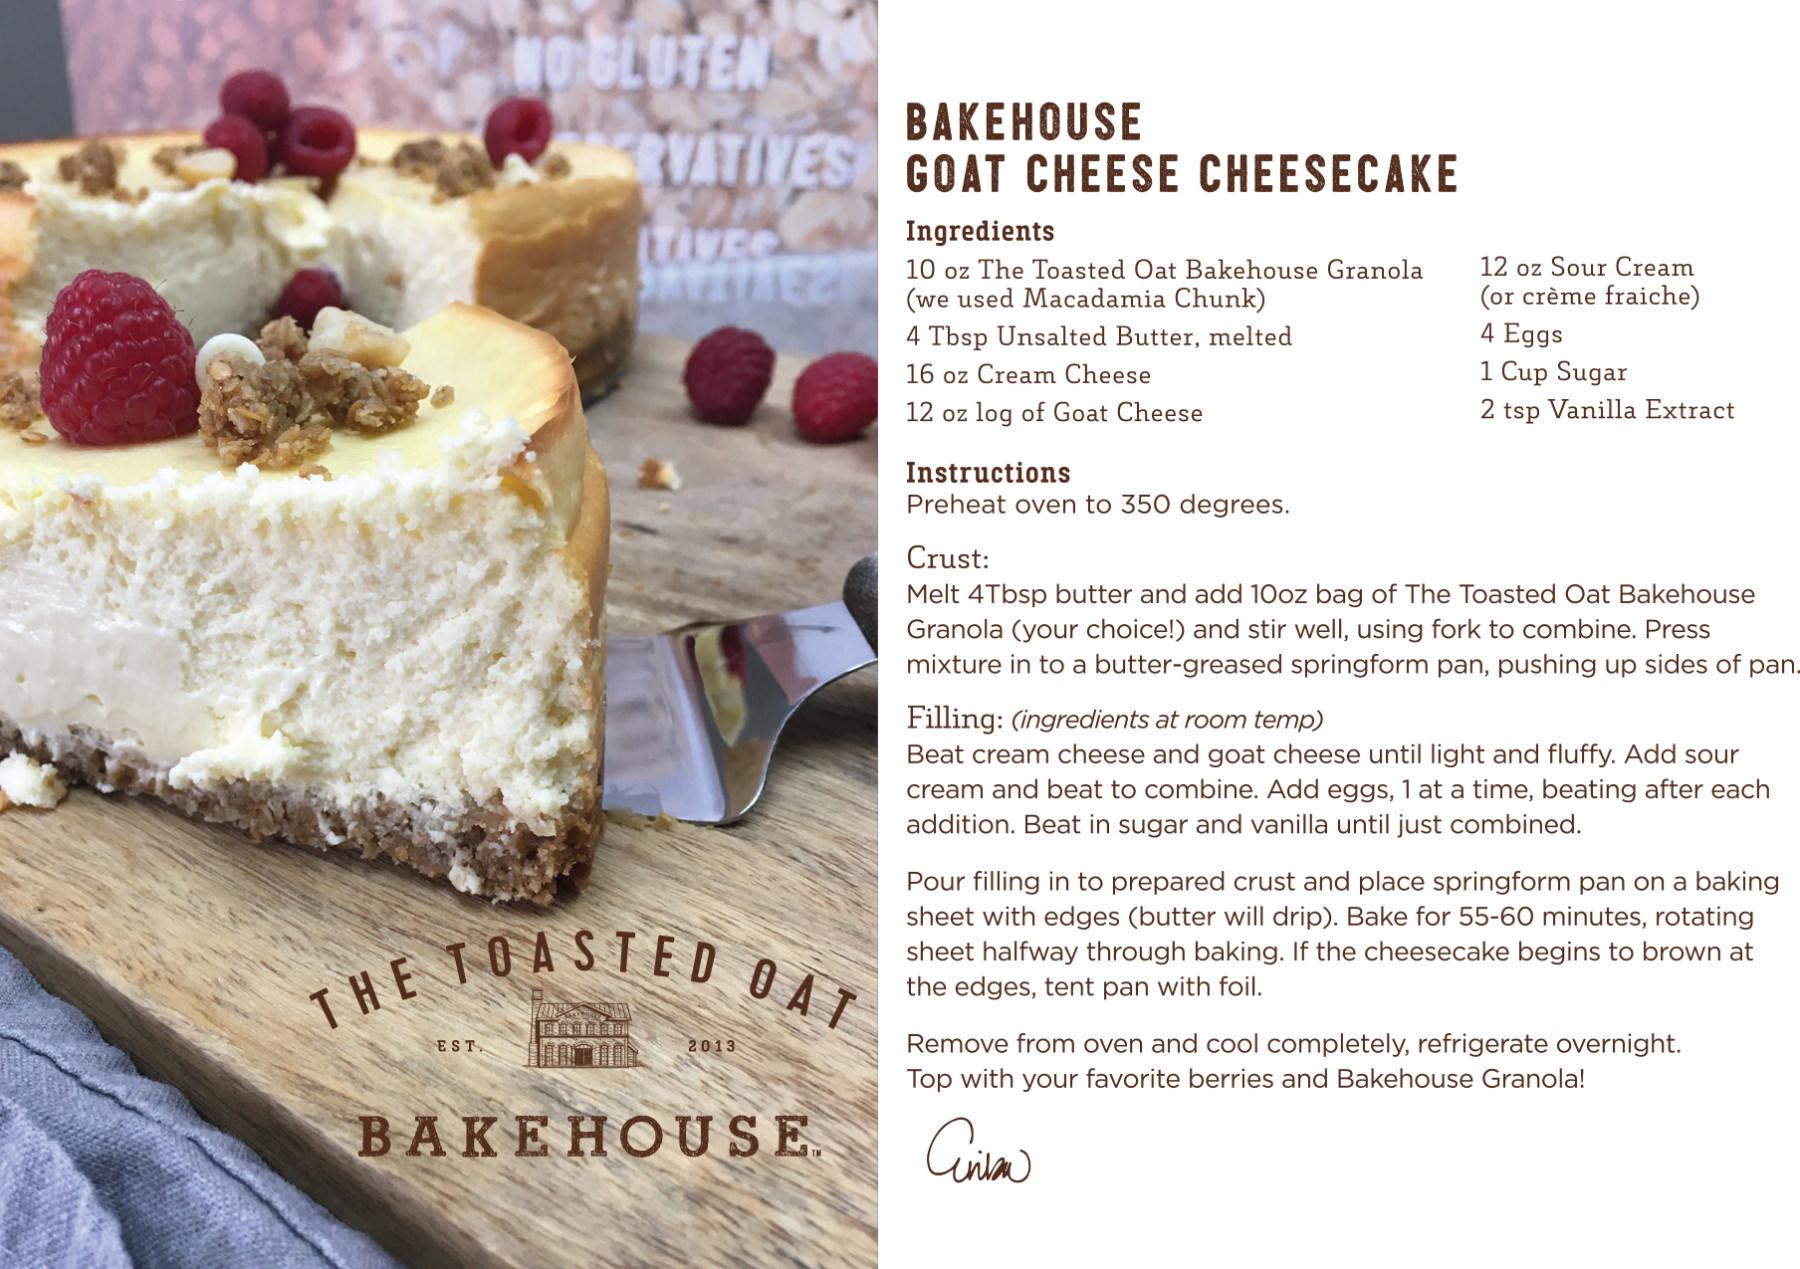 Bakehouse Goat Cheese Cheesecake